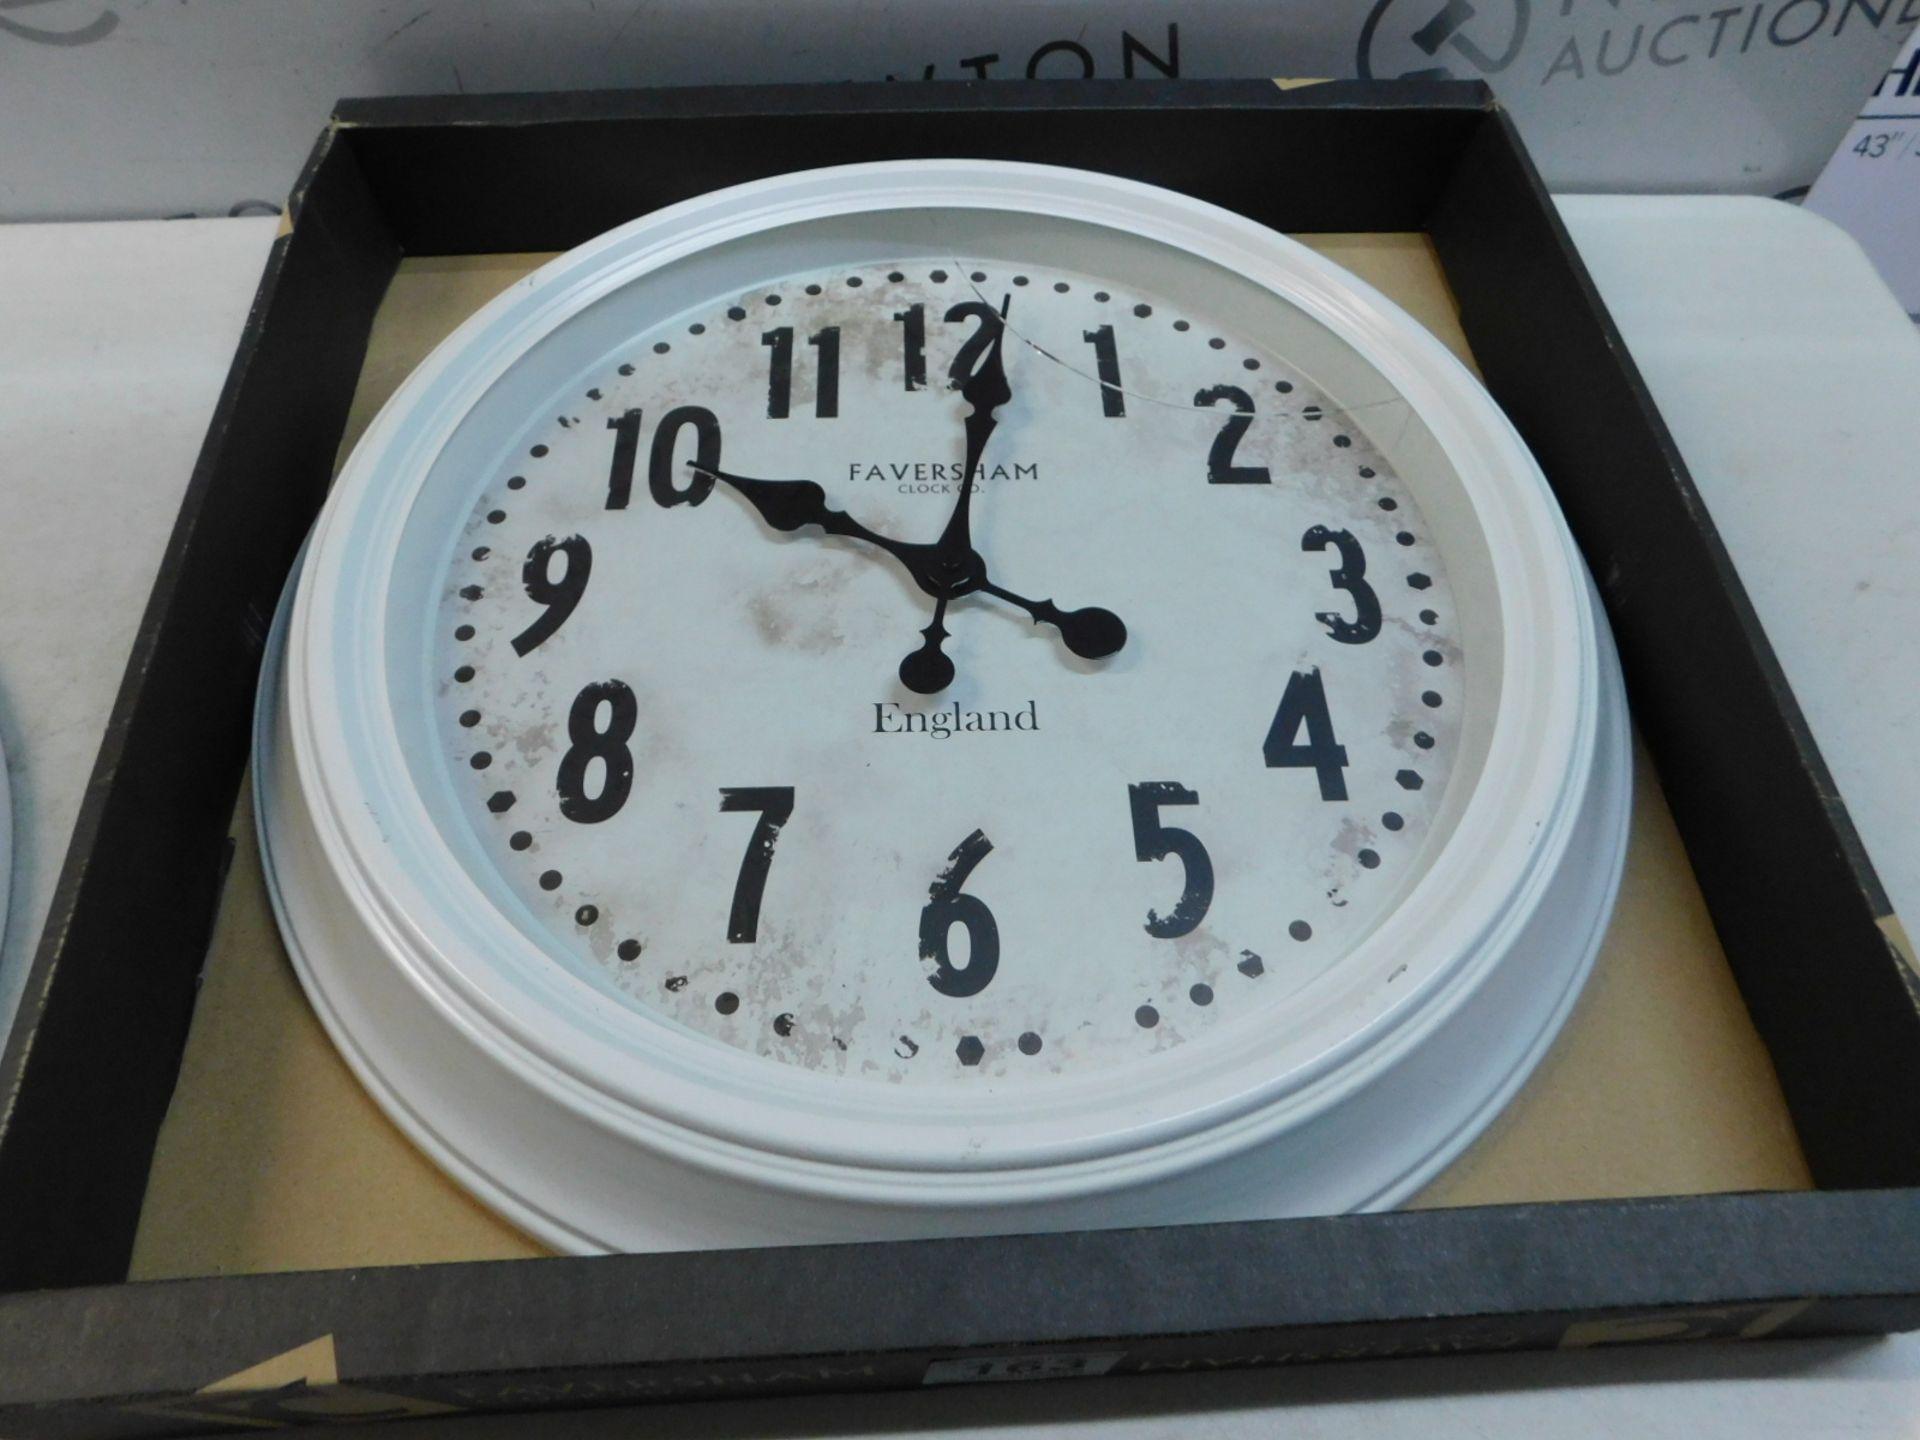 Lot 163 - 1 PACK OF FAVERSHAM CLOCK CO VINTAGE WATCH/ CLOCK RRP £44.99